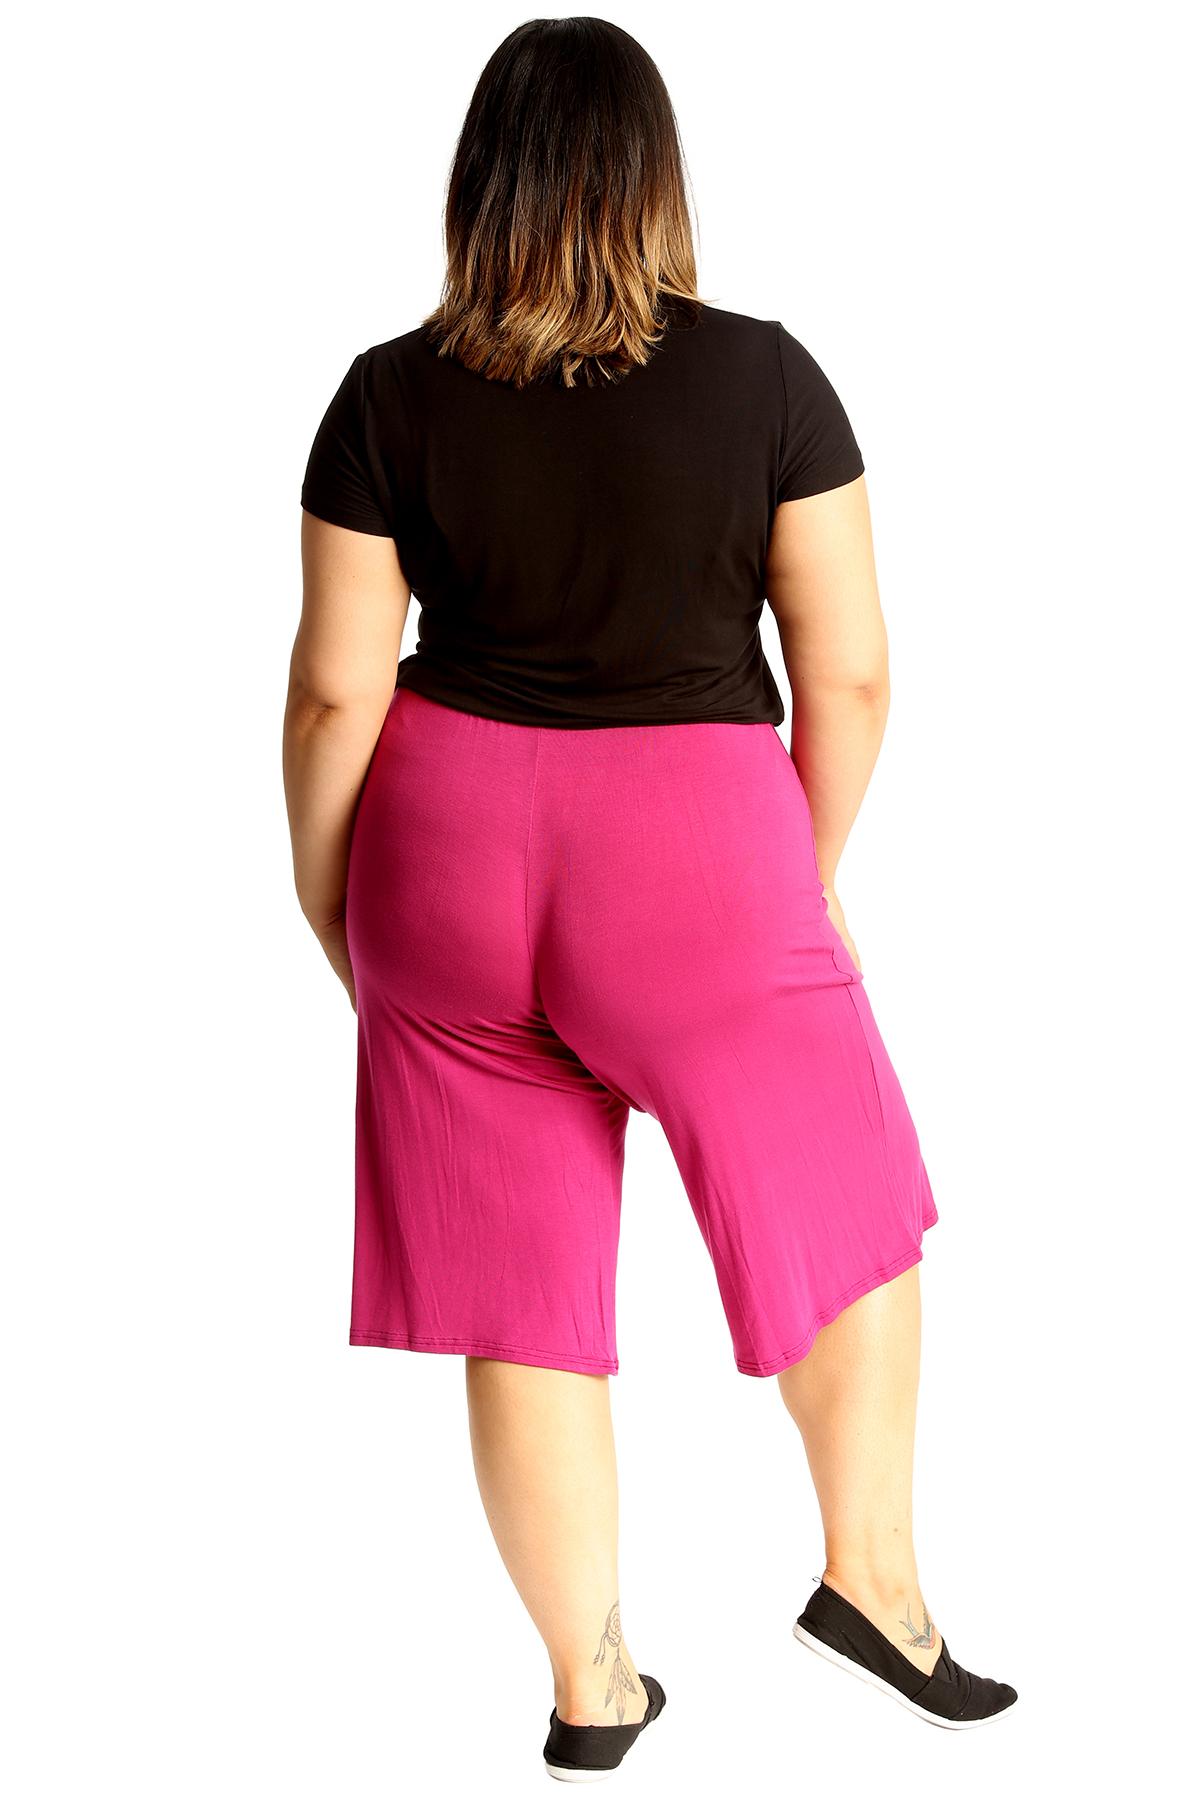 New-Womens-Plus-Size-Culottes-Ladies-Plain-Shorts-Palazzo-Elastic-Pants-Summer thumbnail 64